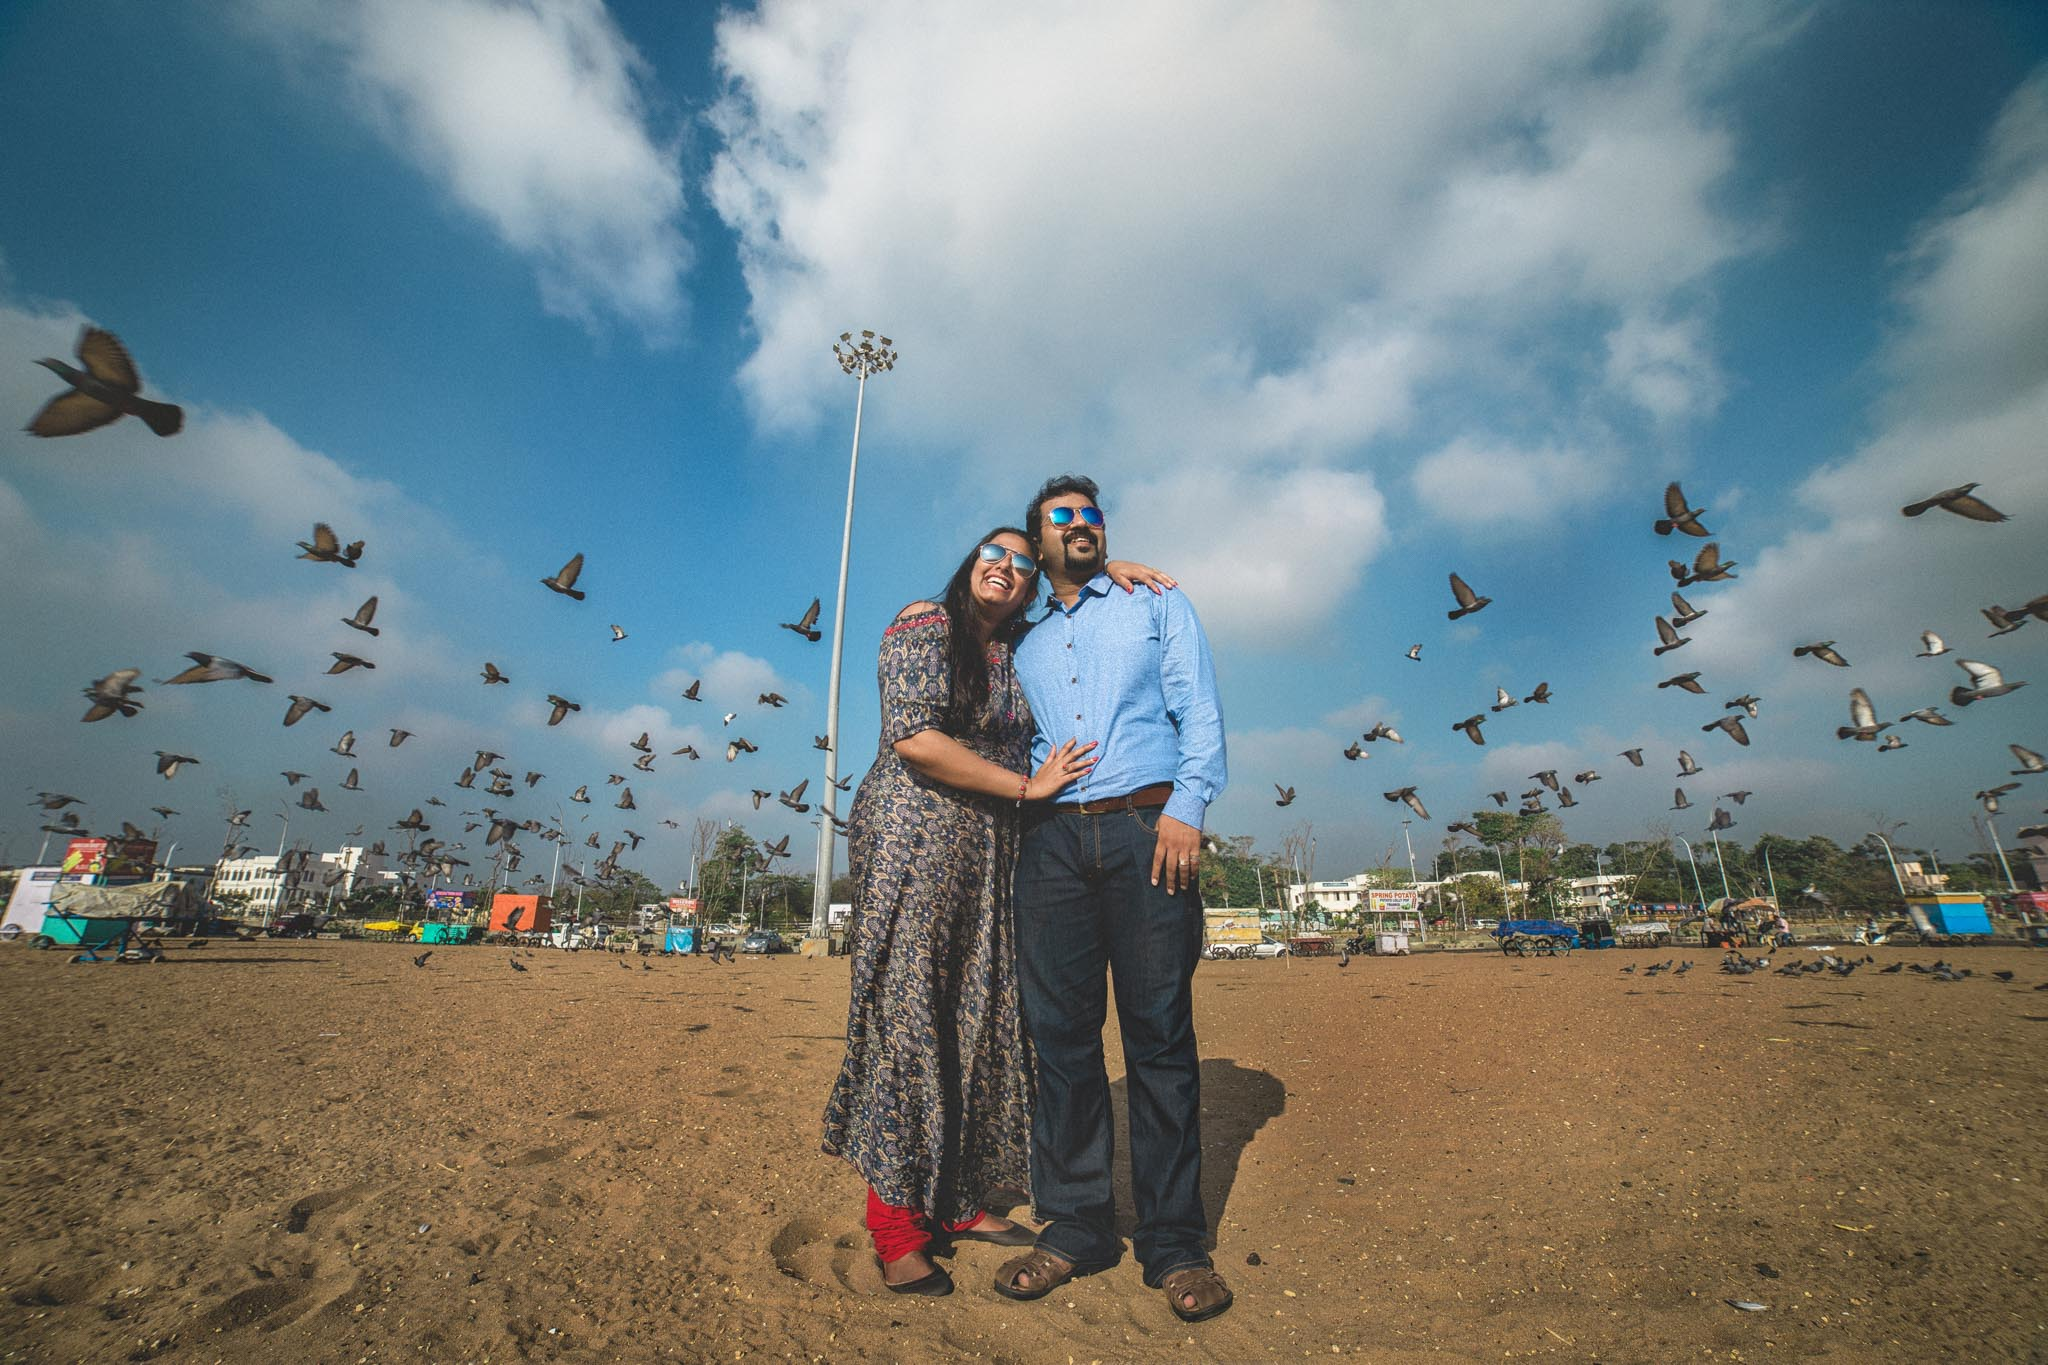 Best-of-2018-wedding-photography-focuz-studios-9